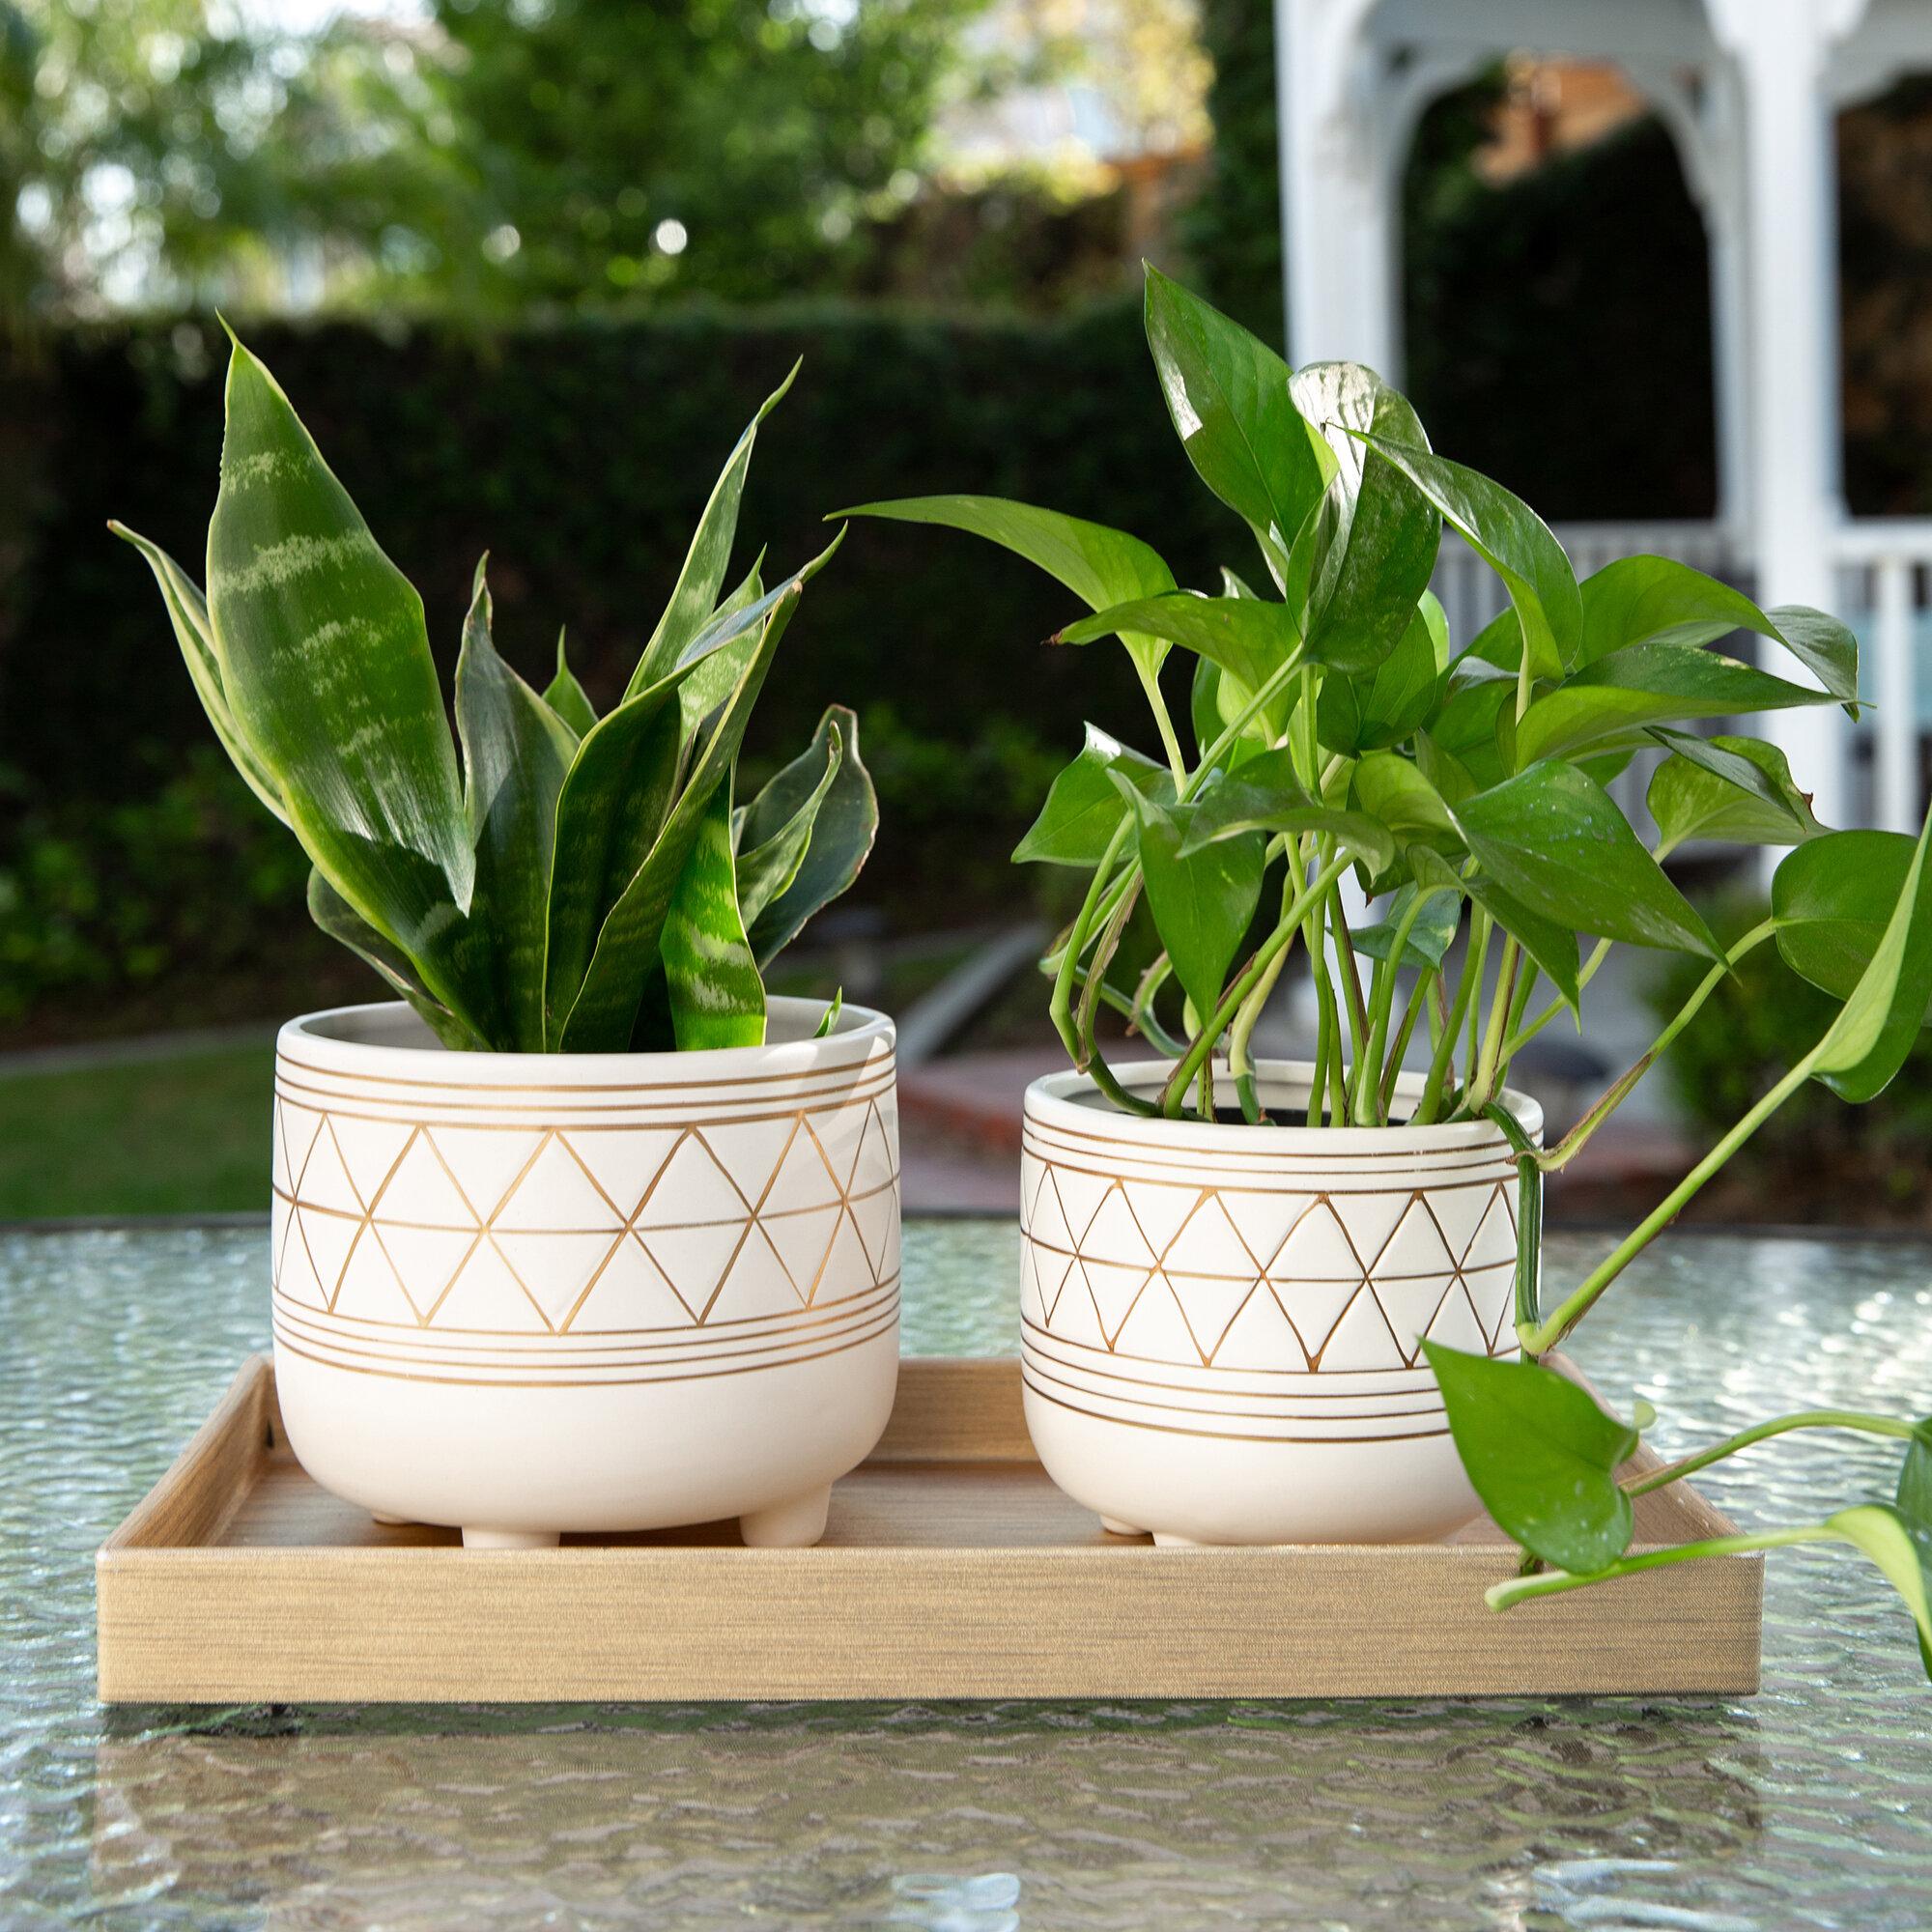 Ceramic Sitting Planter 5 in pot